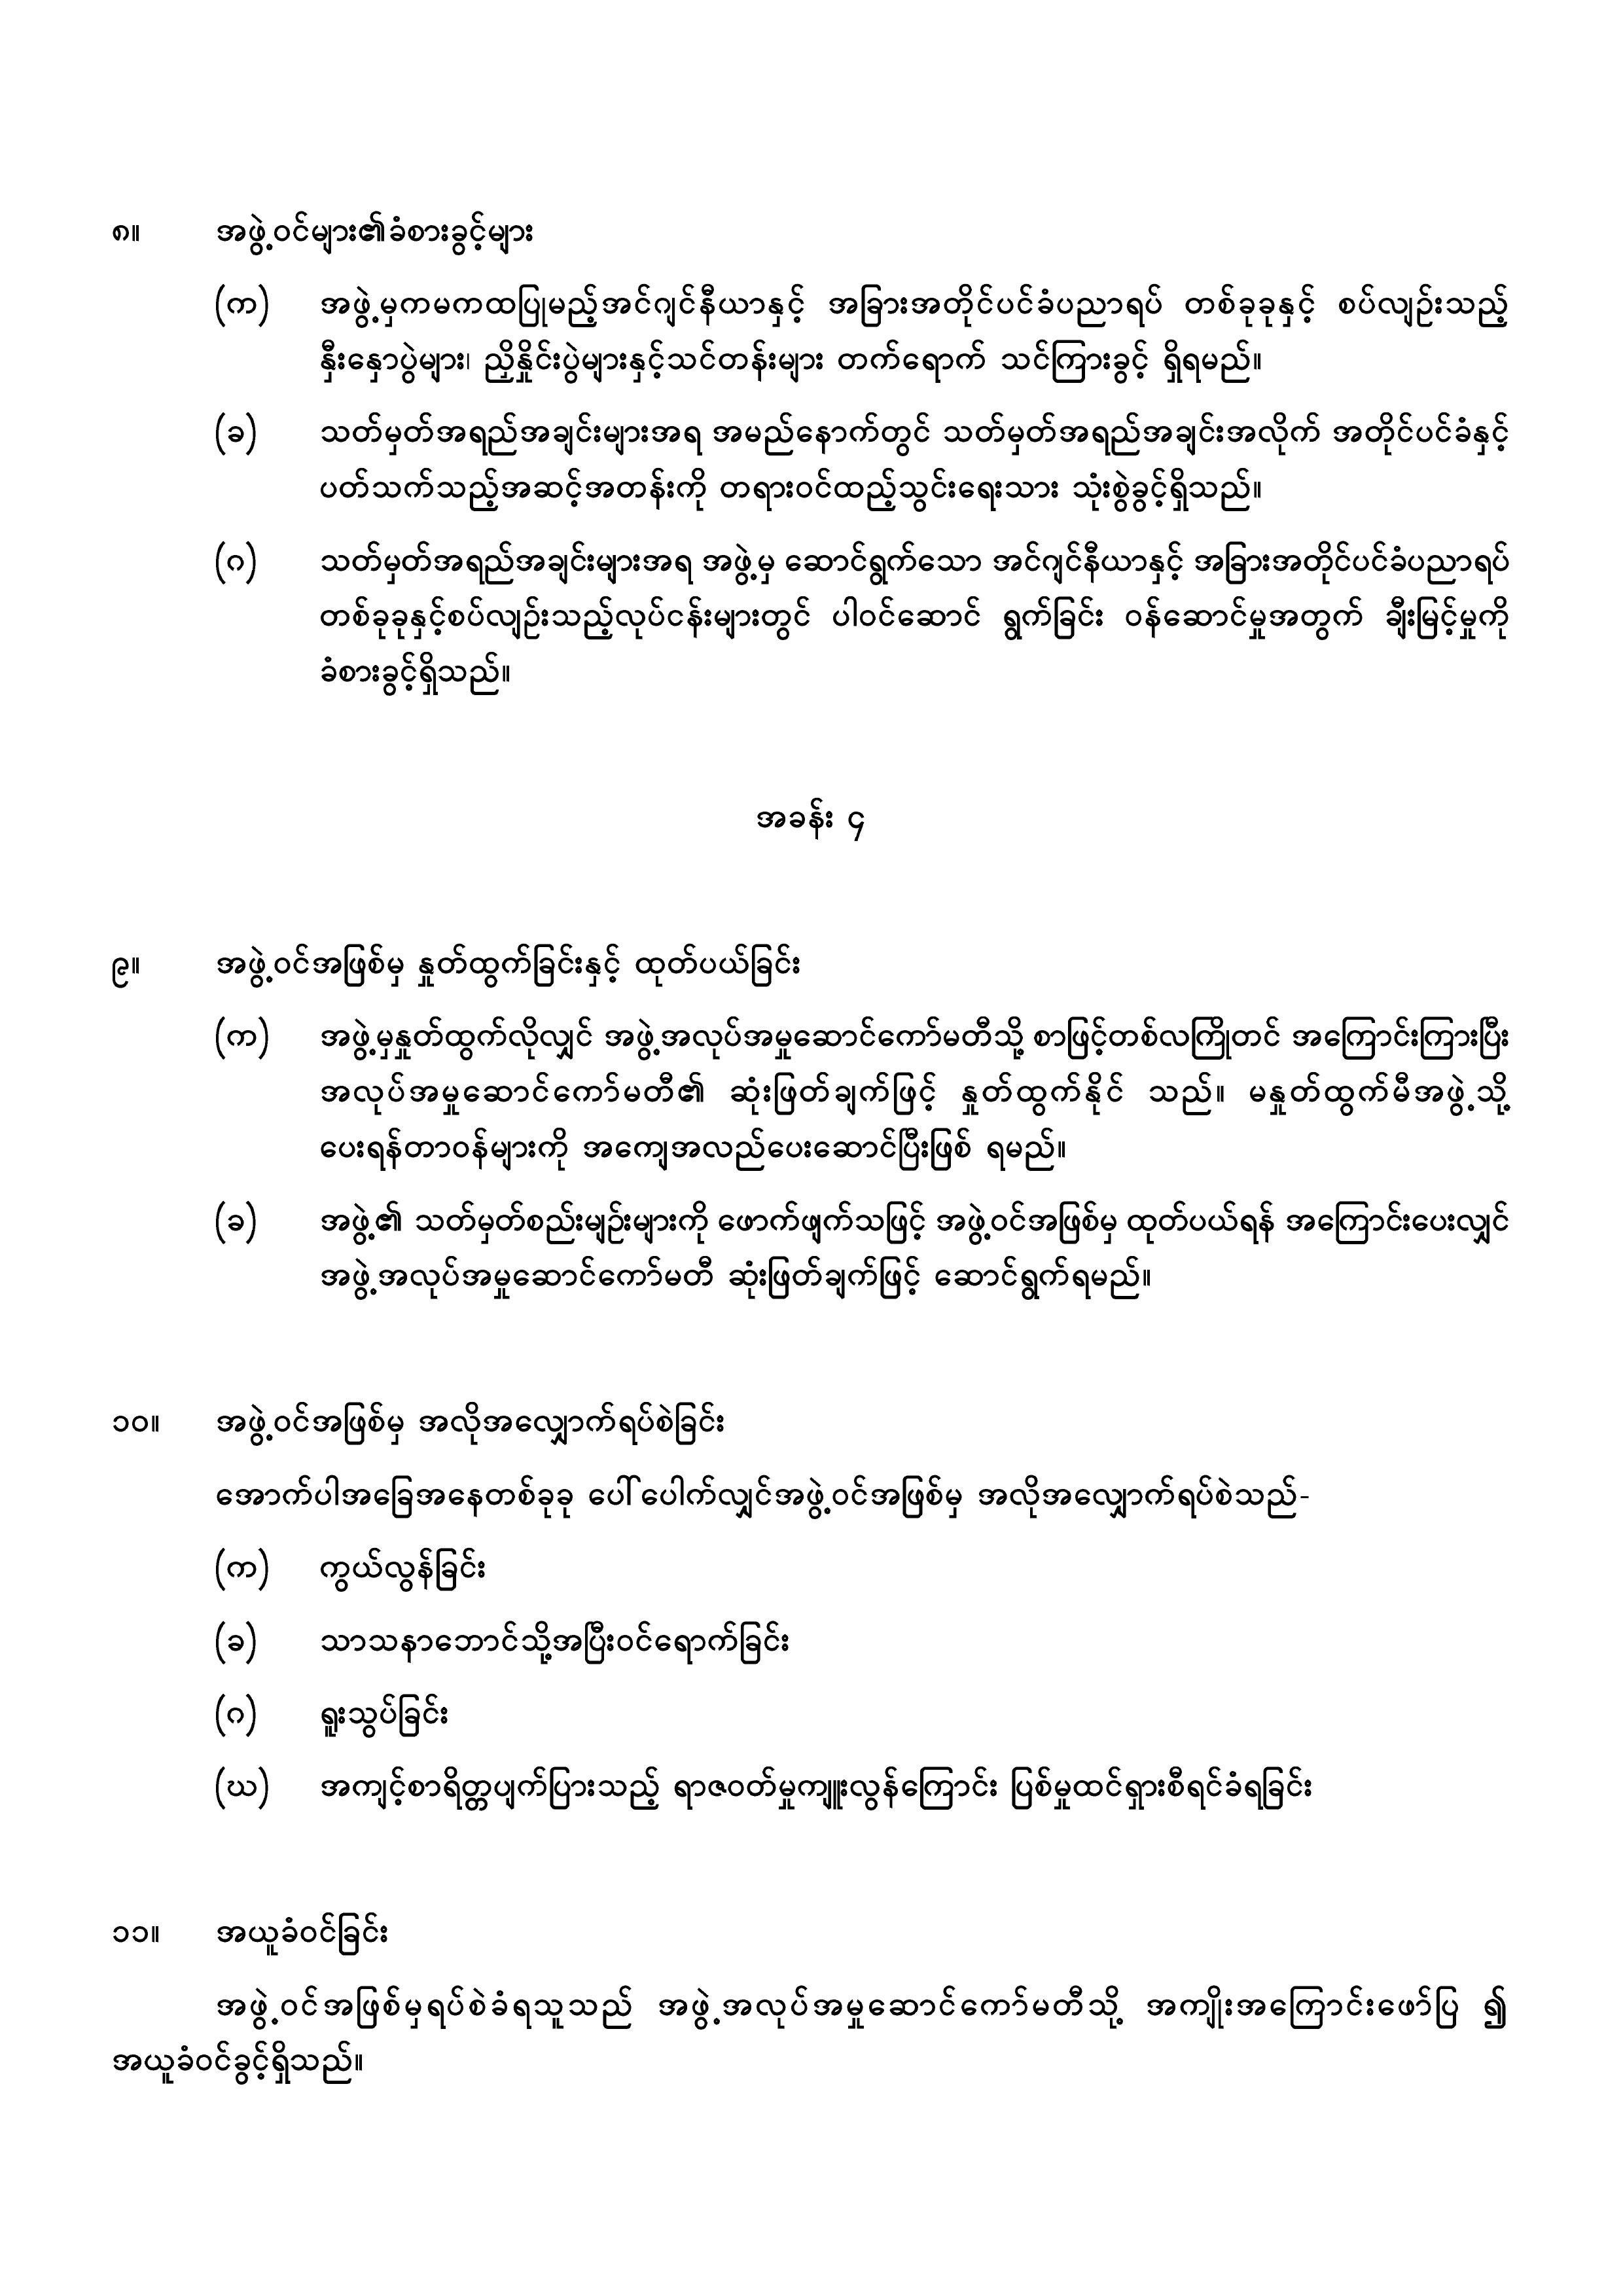 miceg-article-of-association-3